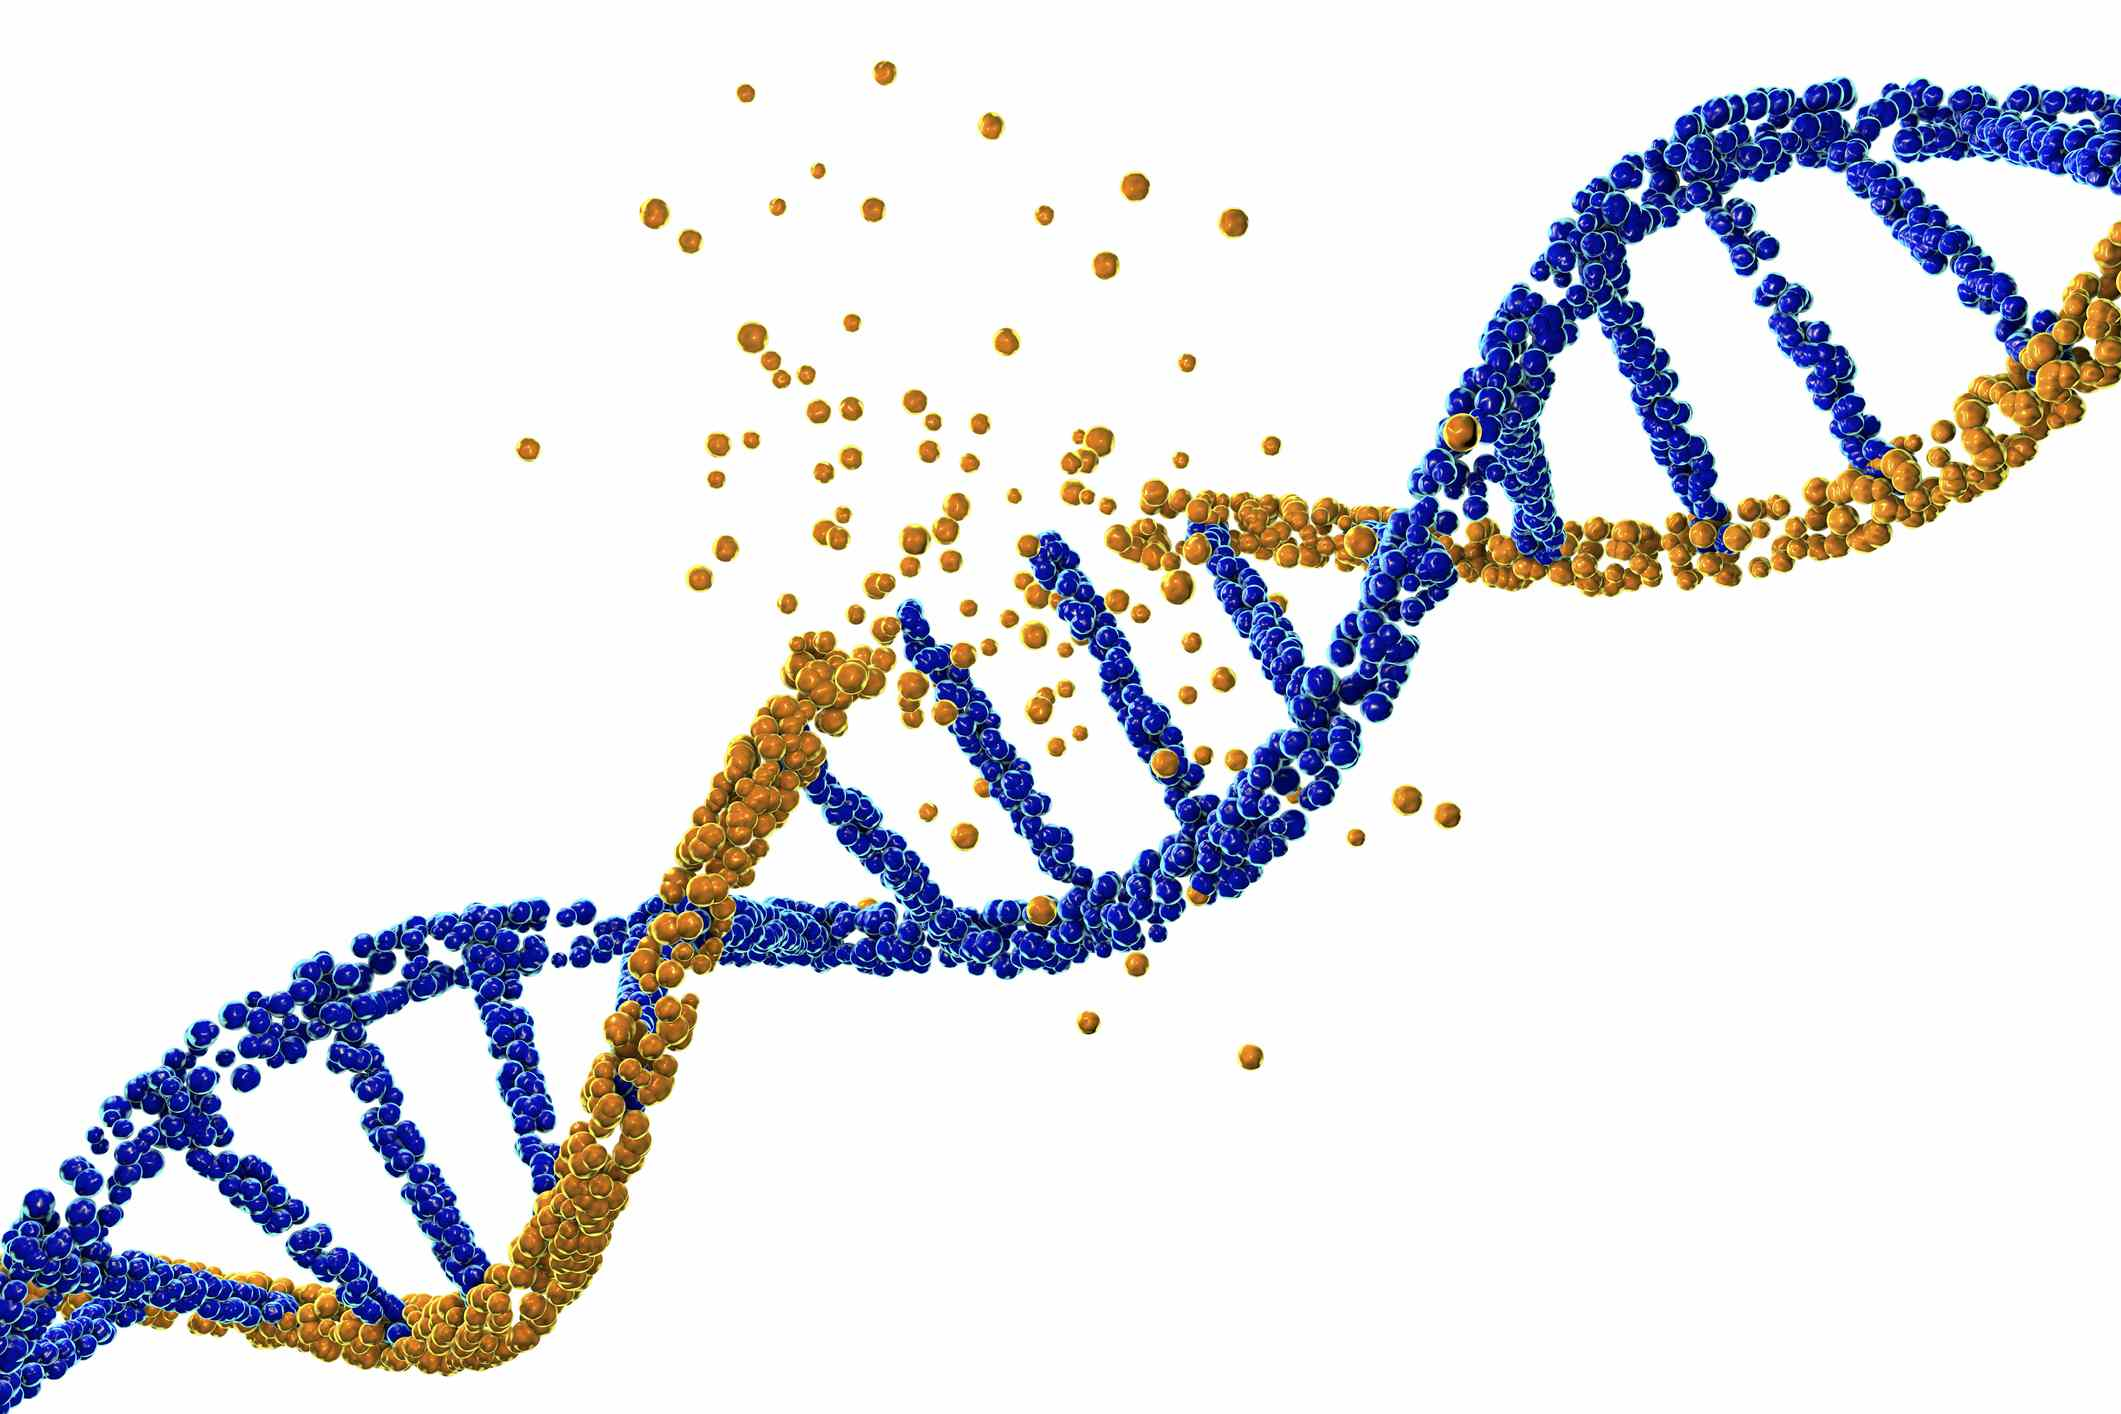 DNA damage, illustration - stock illustration